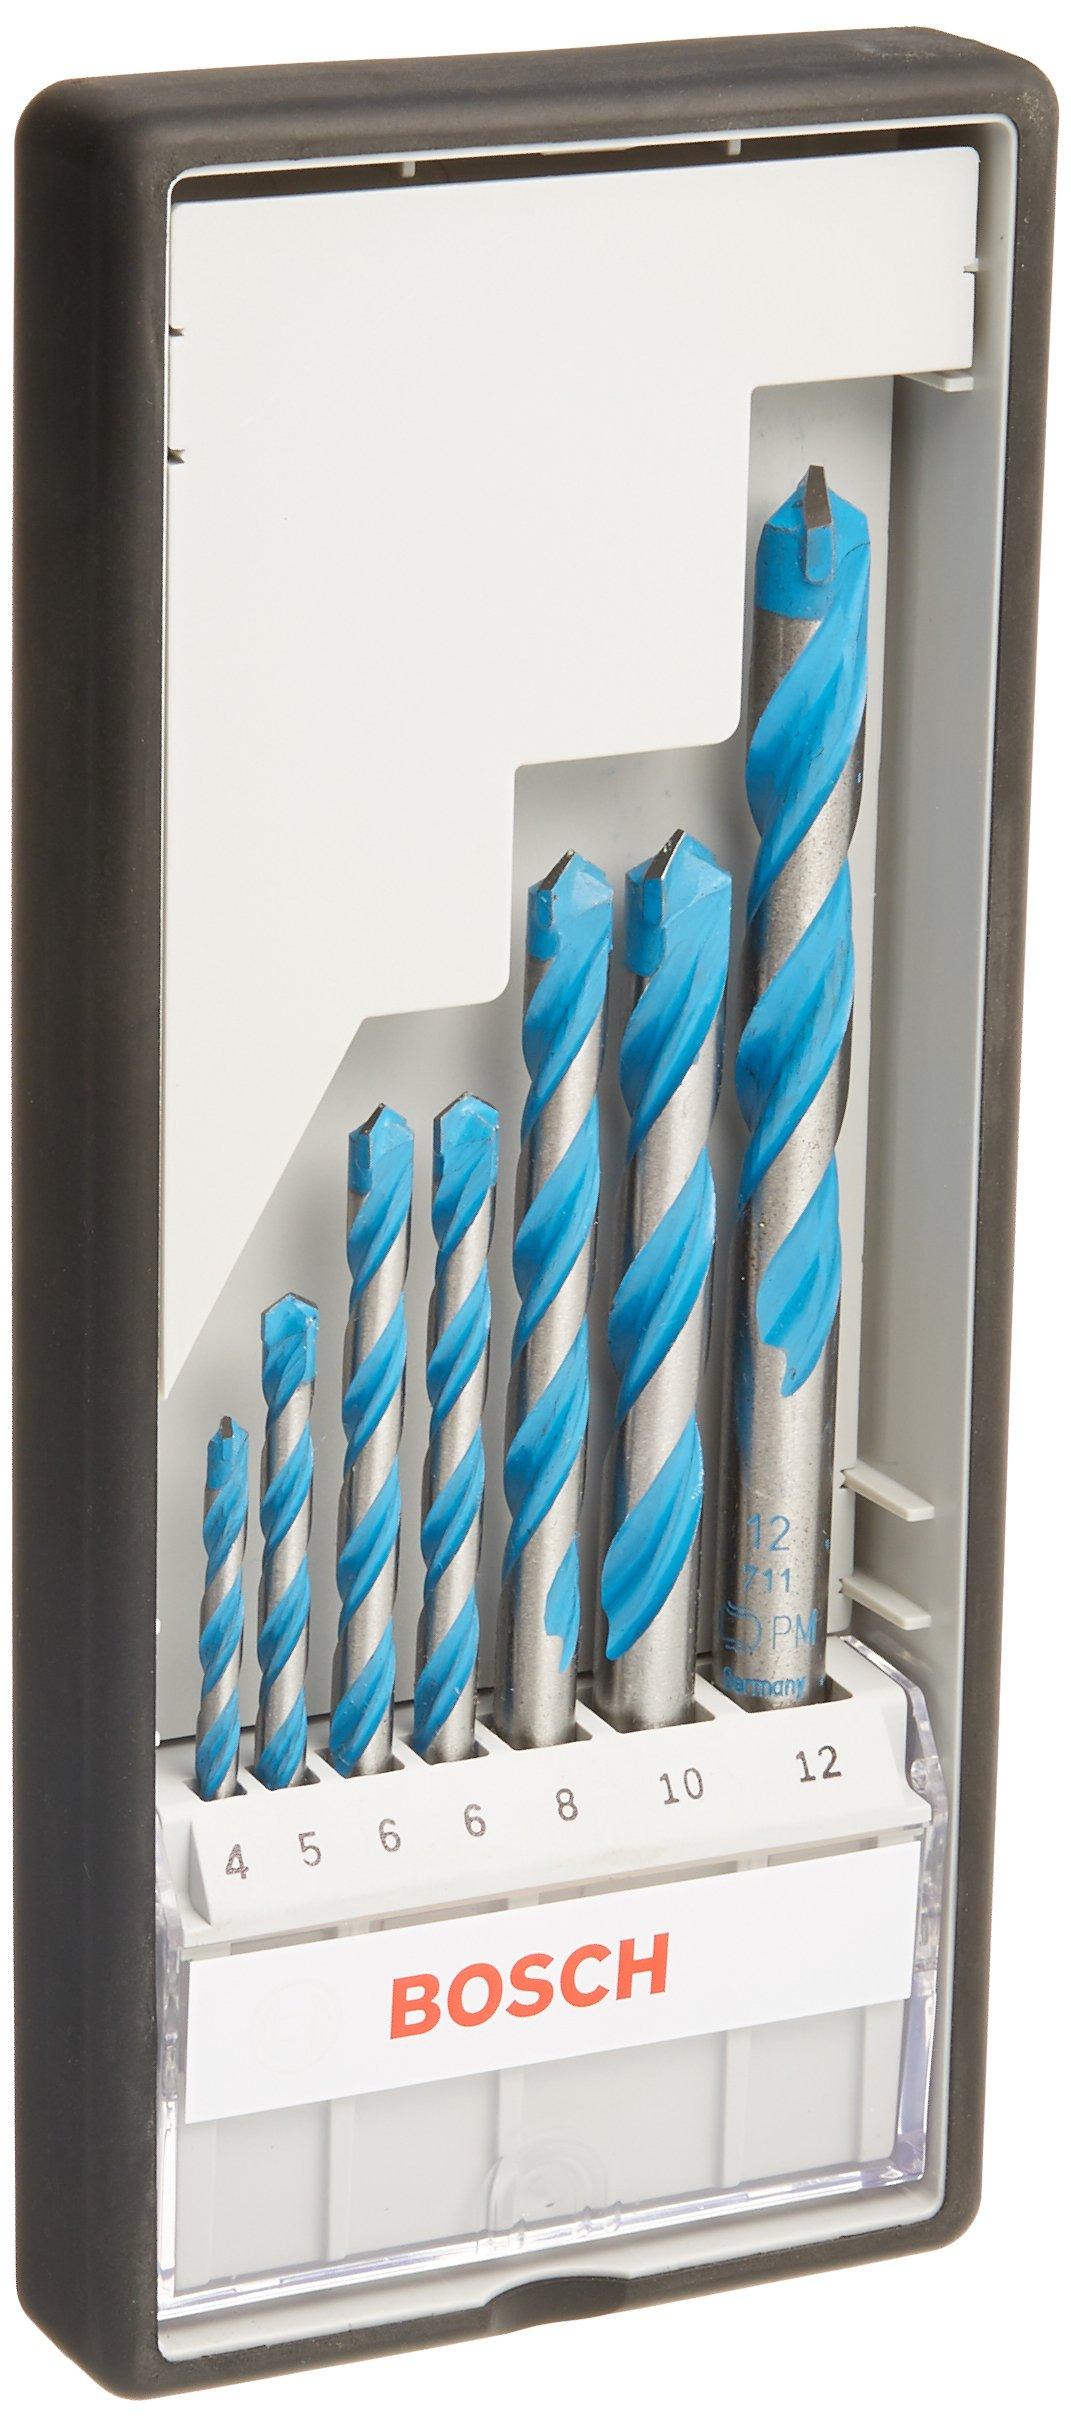 Bosch Professional – Juego de 7 brocas multiuso Robust Line CYL-9 MultiConstruction (4 5 6 6 8 10 12 mm)